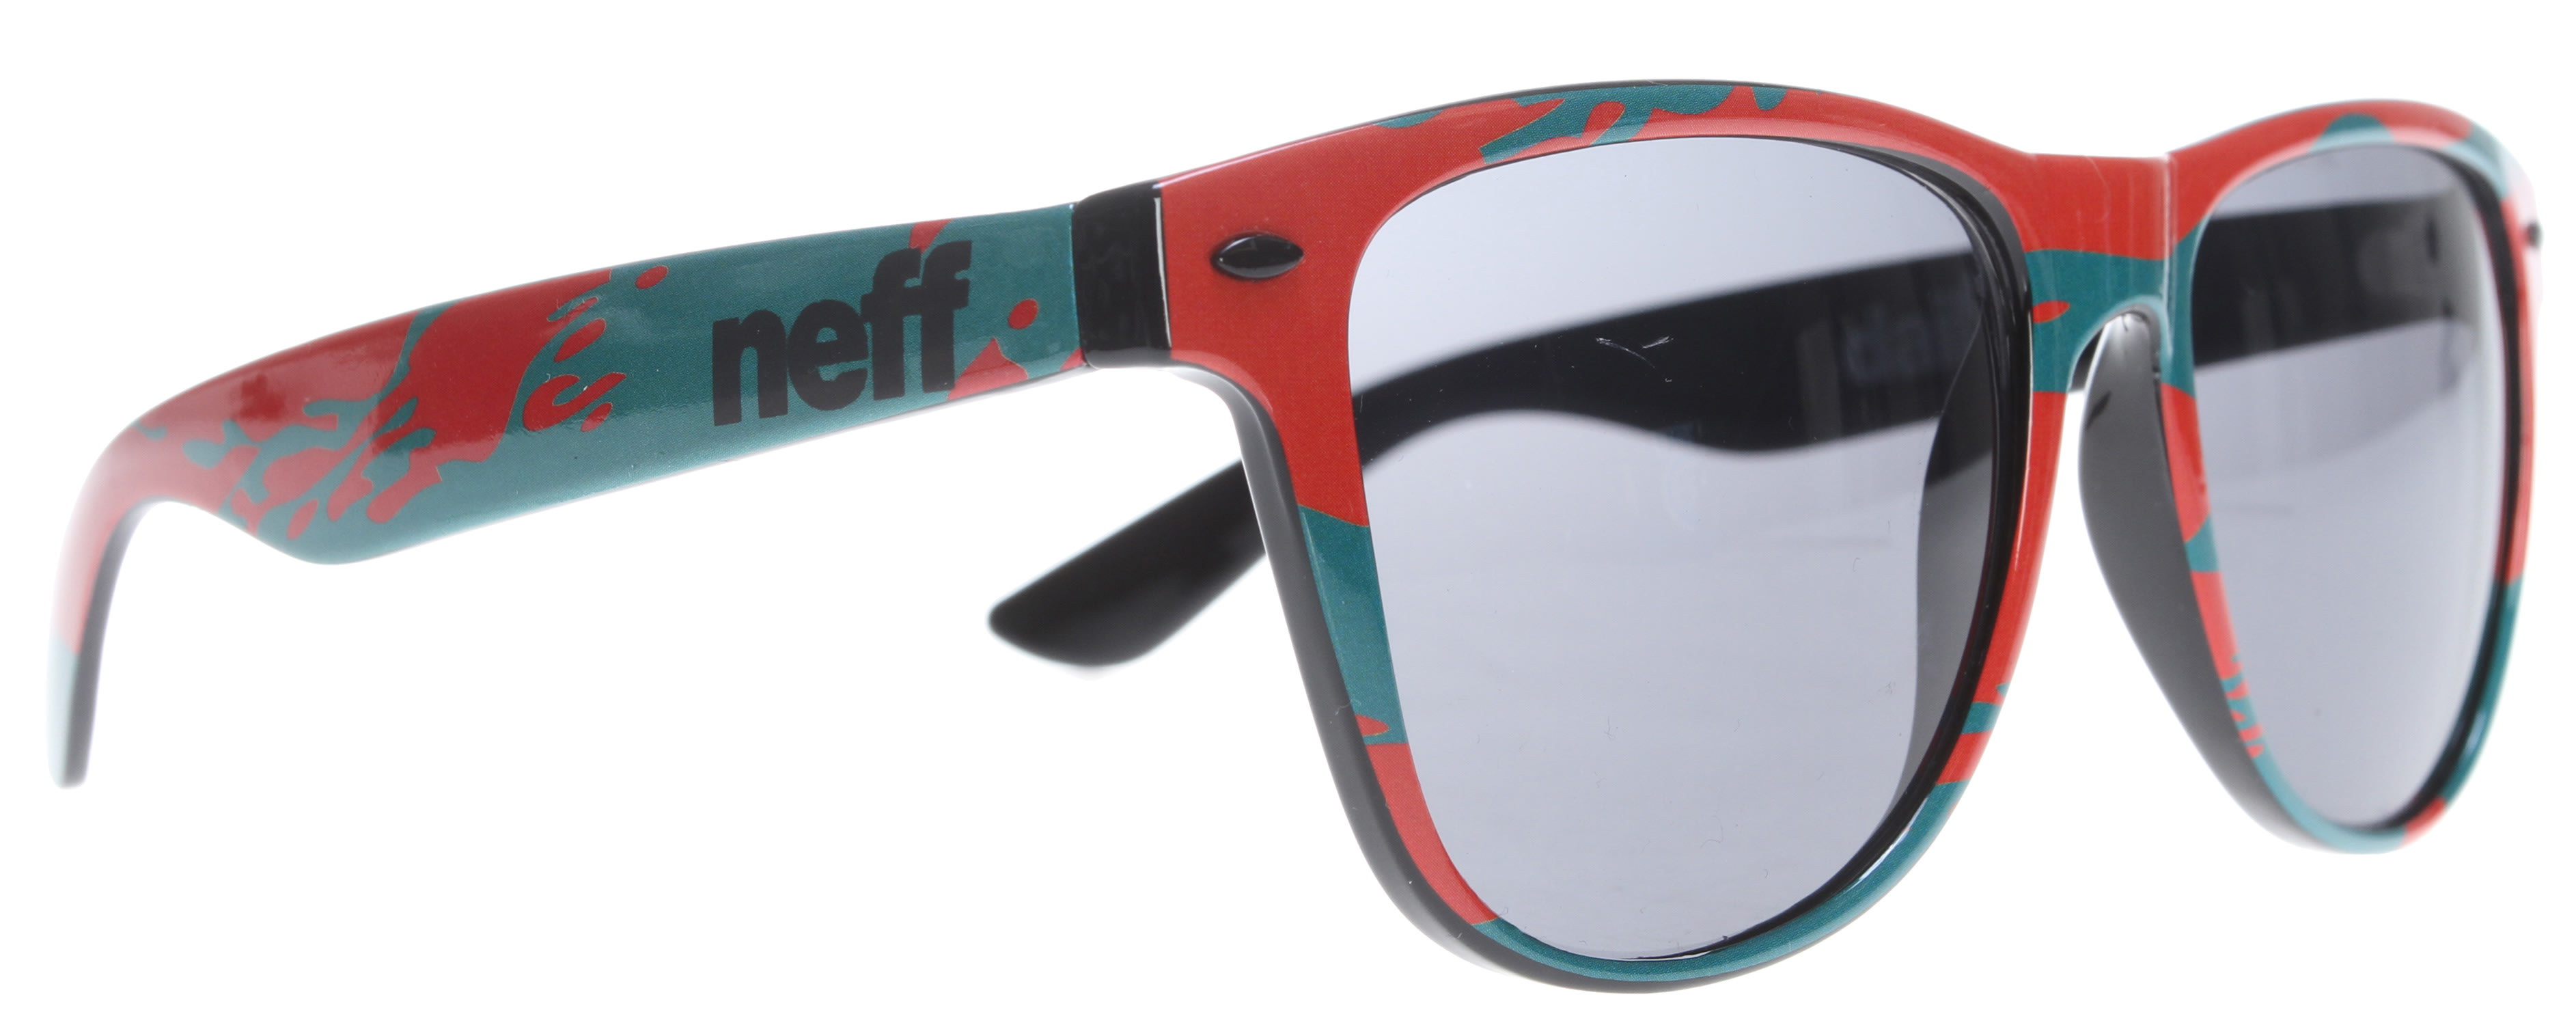 16695ad1a89 Neff Daily Sunglasses - thumbnail 1